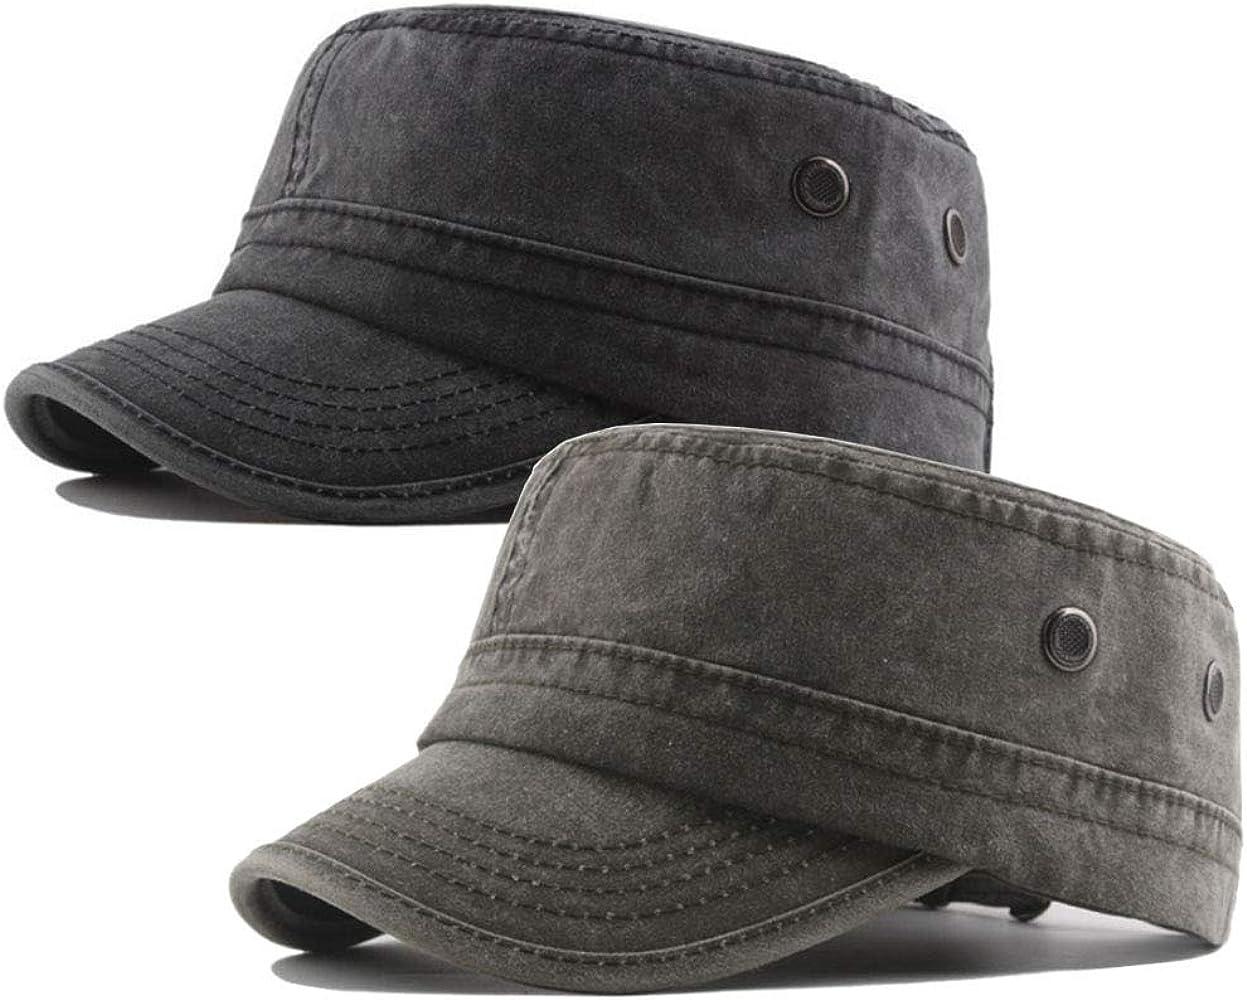 VINTAGE RETRO CADET CAP HAT 6 COLOURS ONE SIZE  ADJUSTABLE ARMY MILITARY